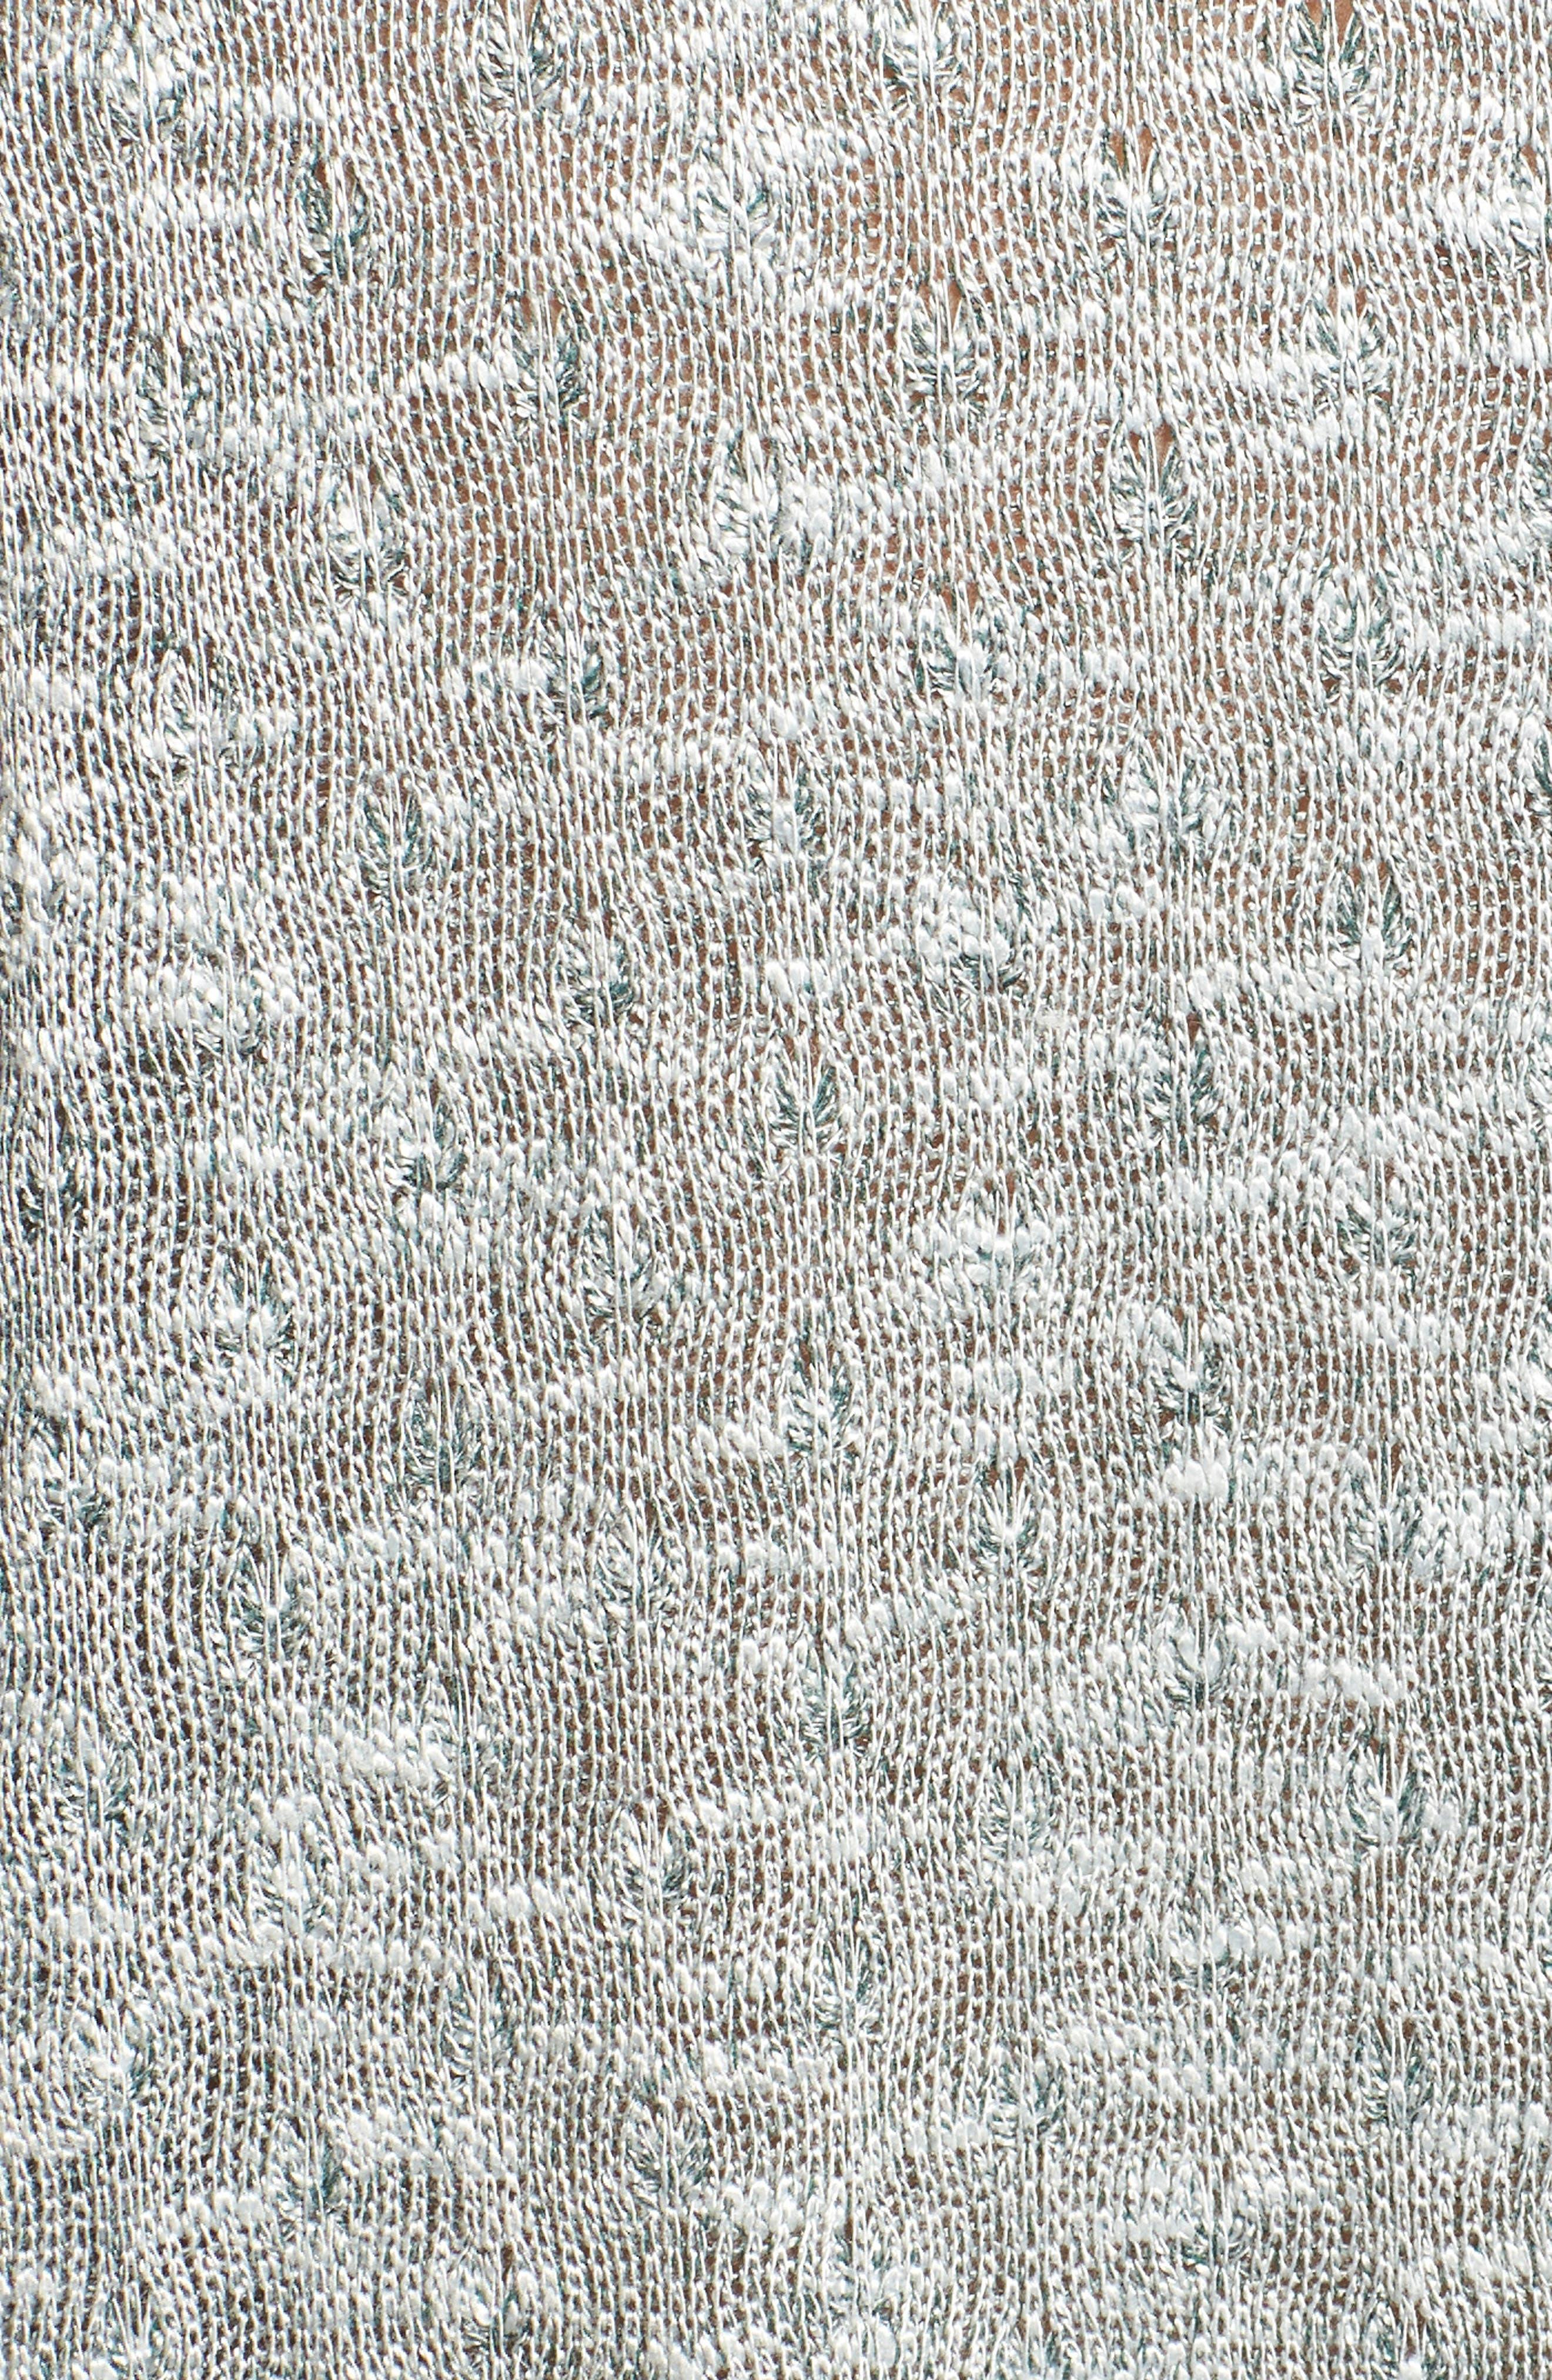 Marled Knit Short Sleeve Top,                             Alternate thumbnail 6, color,